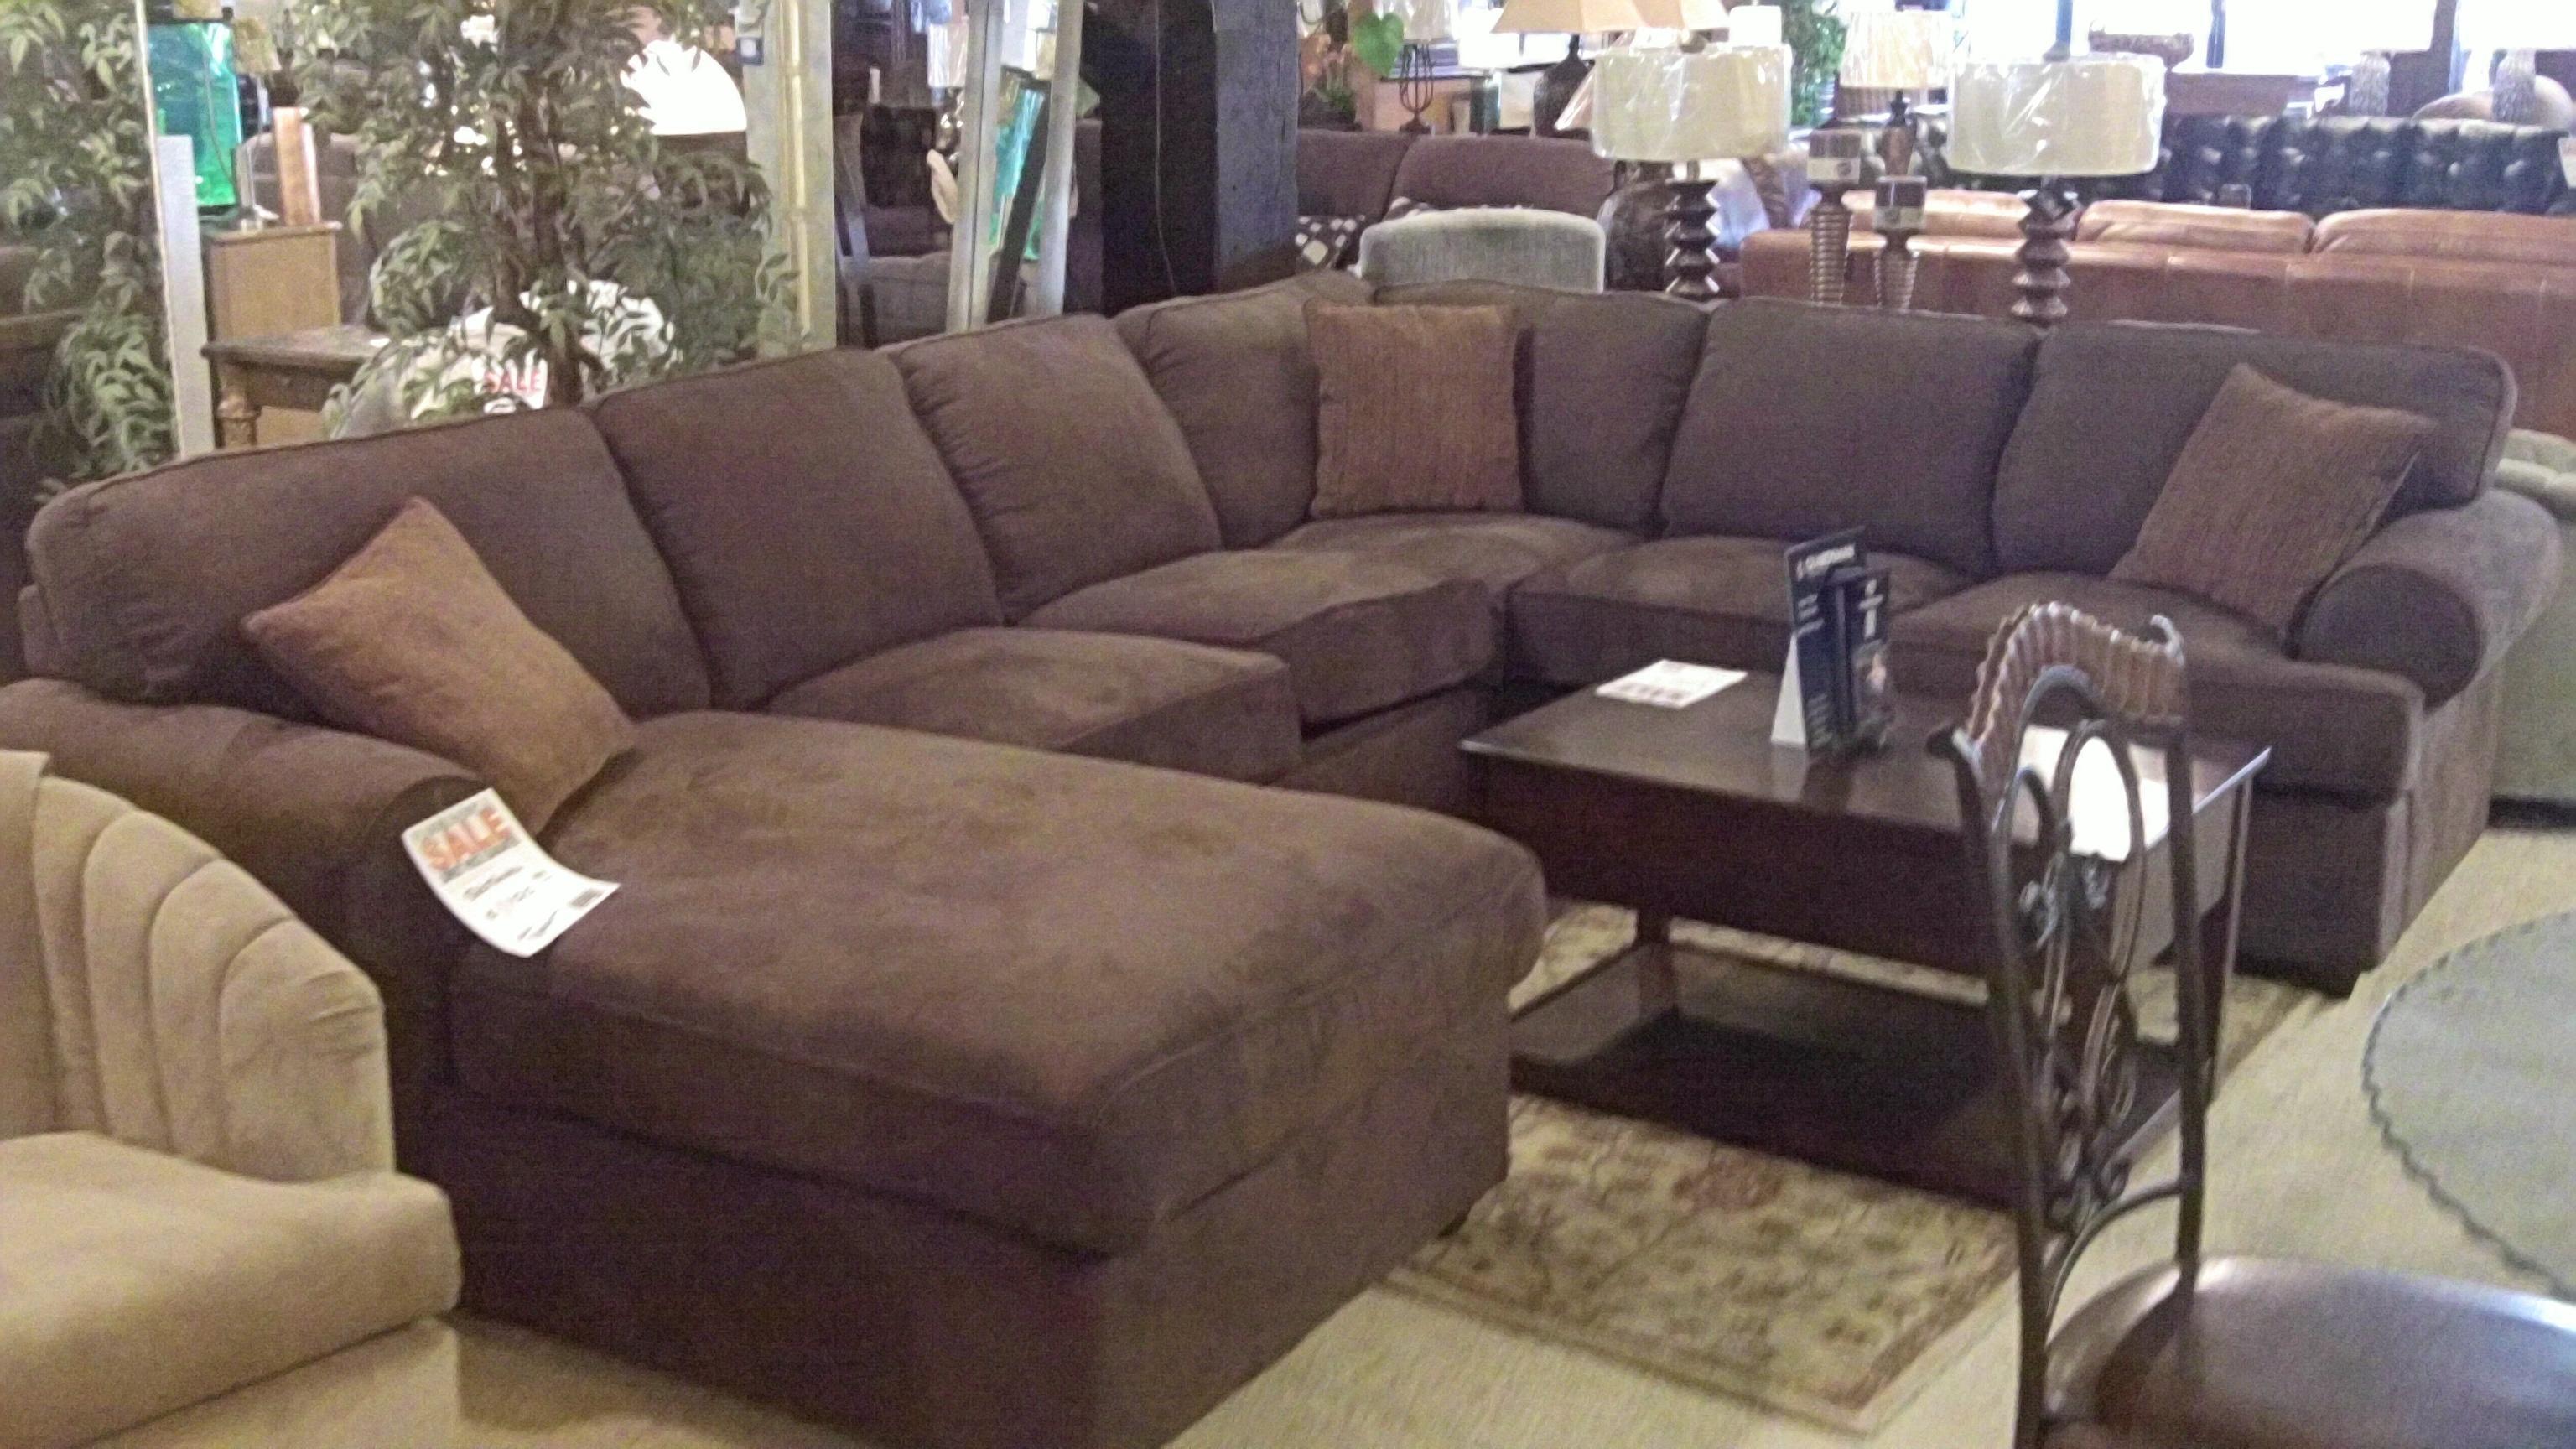 Sofas Center : Sofas For Less Sectional Than 1000Sofas Livermore Regarding Sectional Sofa San Diego (View 16 of 20)